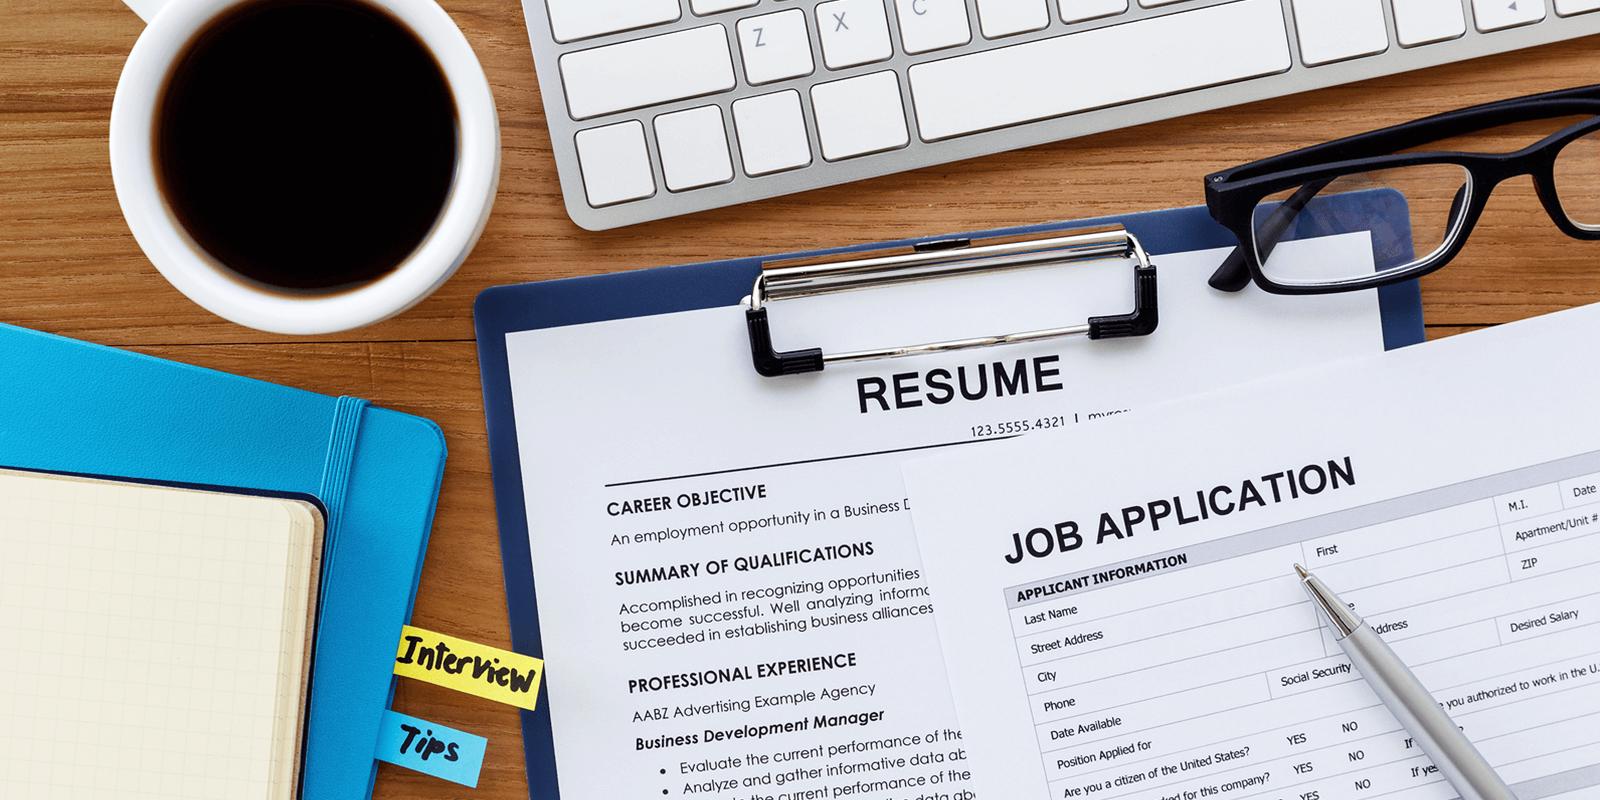 Resume-and-application-esmqj